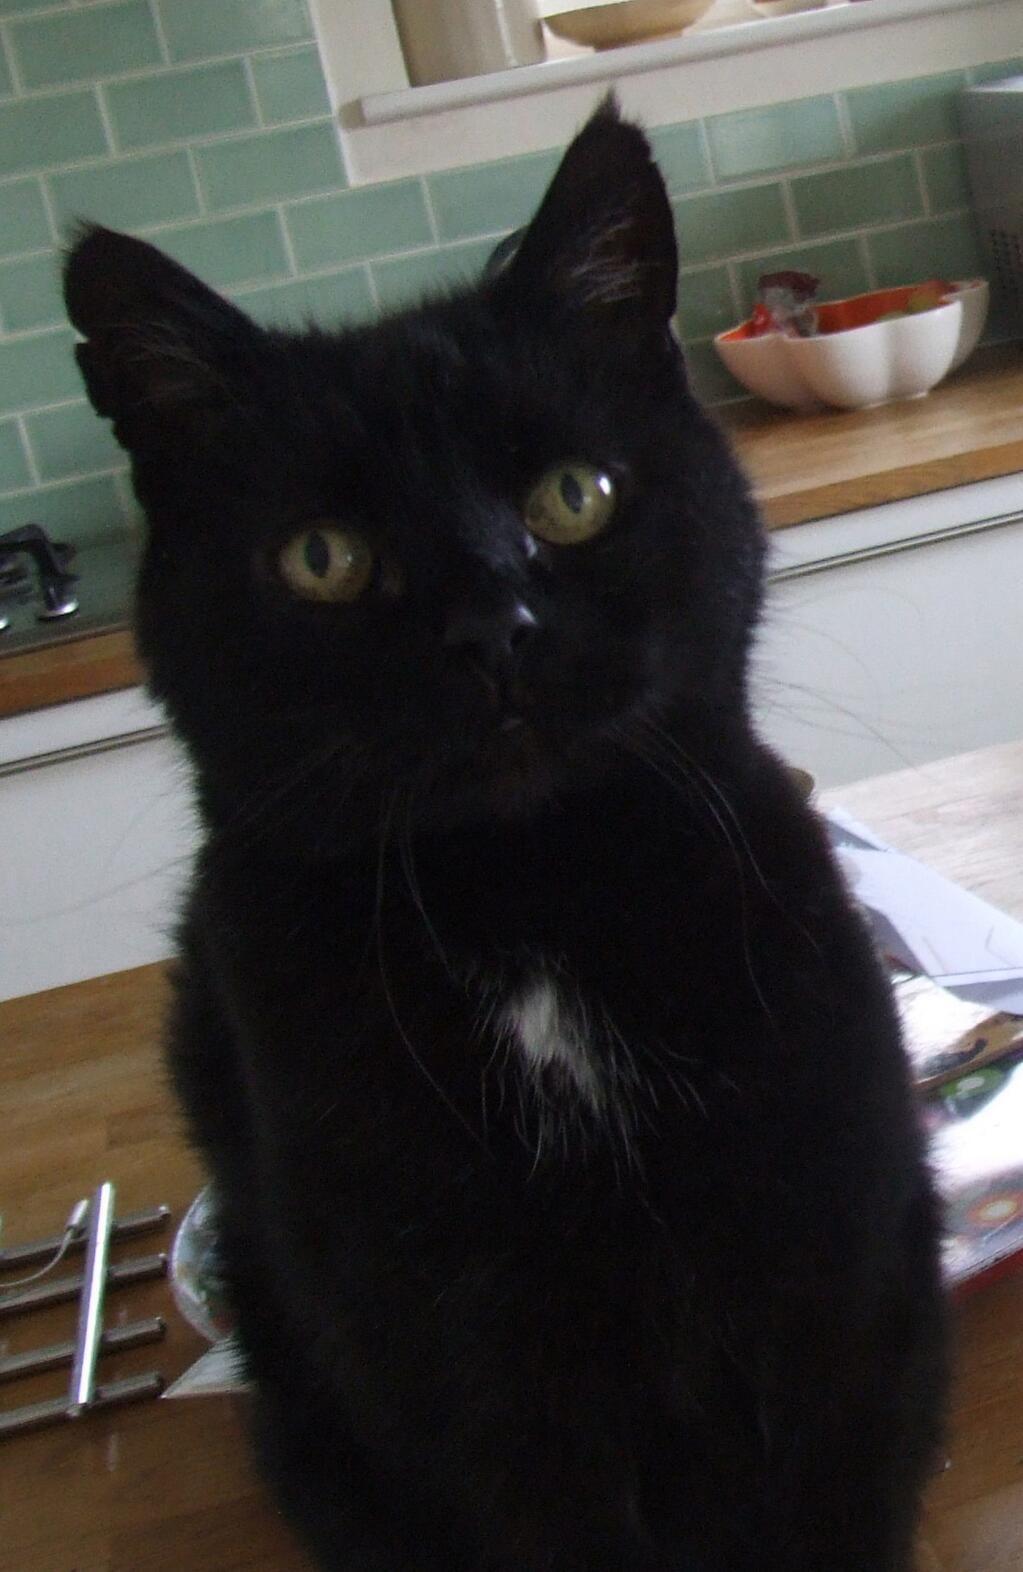 Pin on Black Catslike Buckwheat!